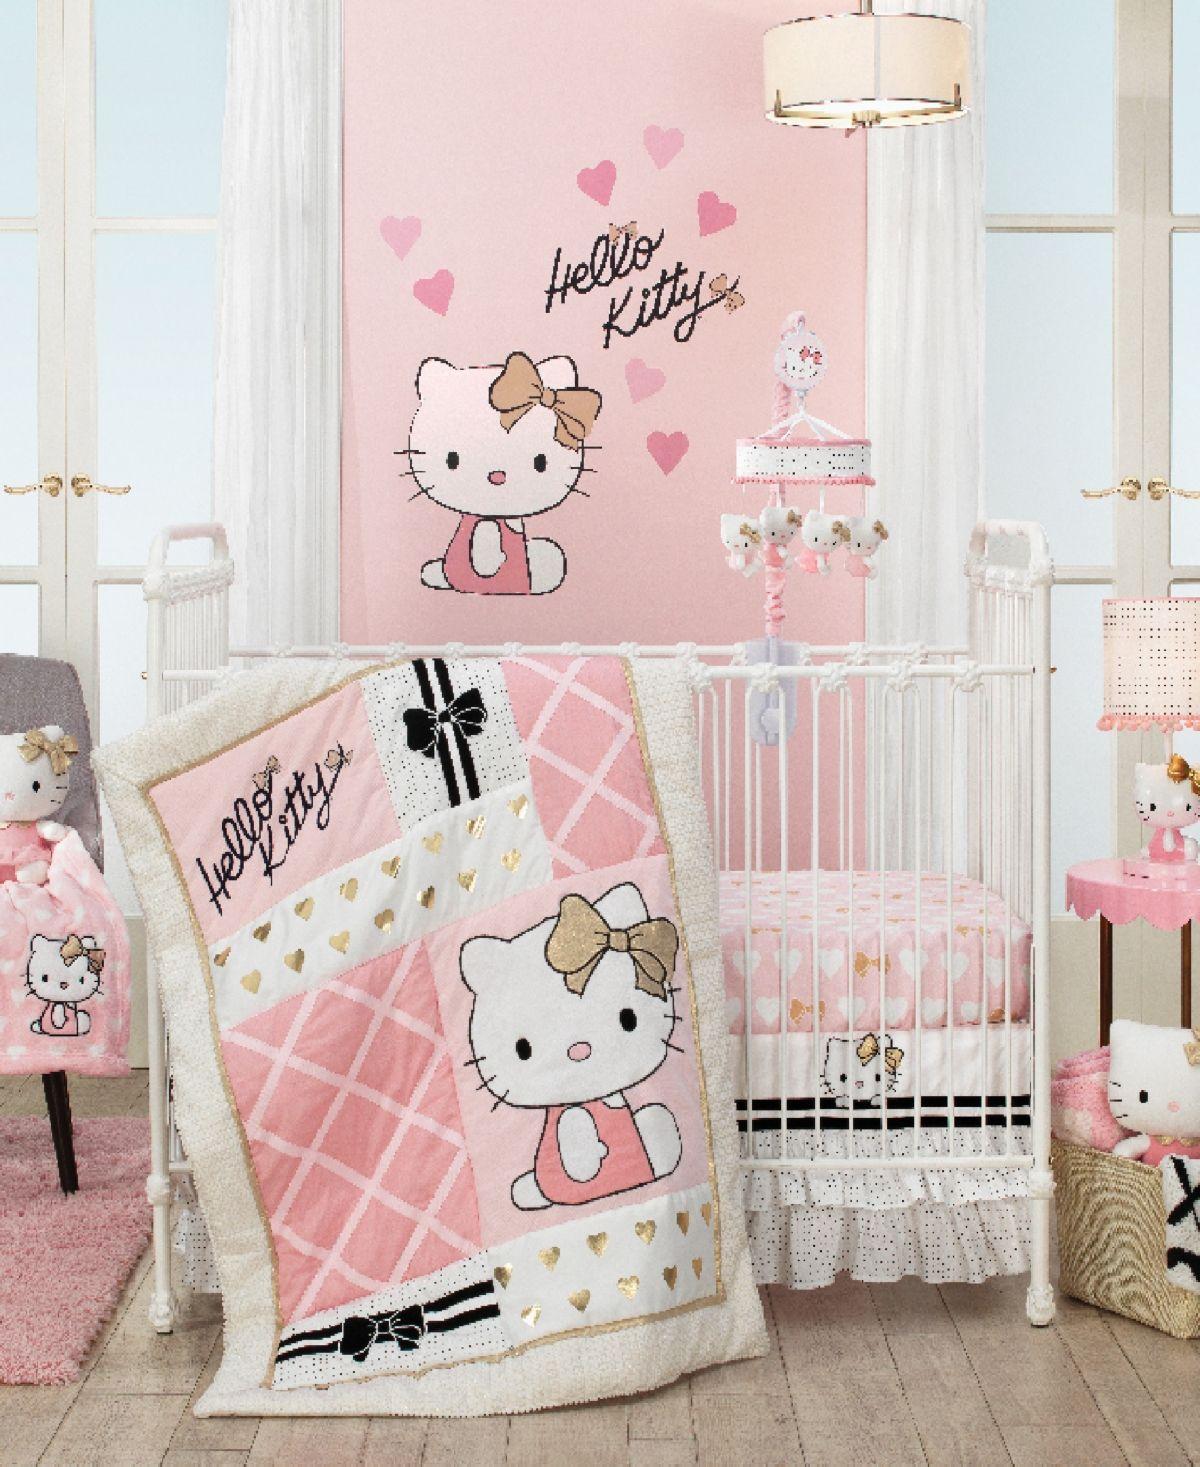 Lambs Ivy Hello Kitty With Hearts Nursery 3 Piece Baby Crib